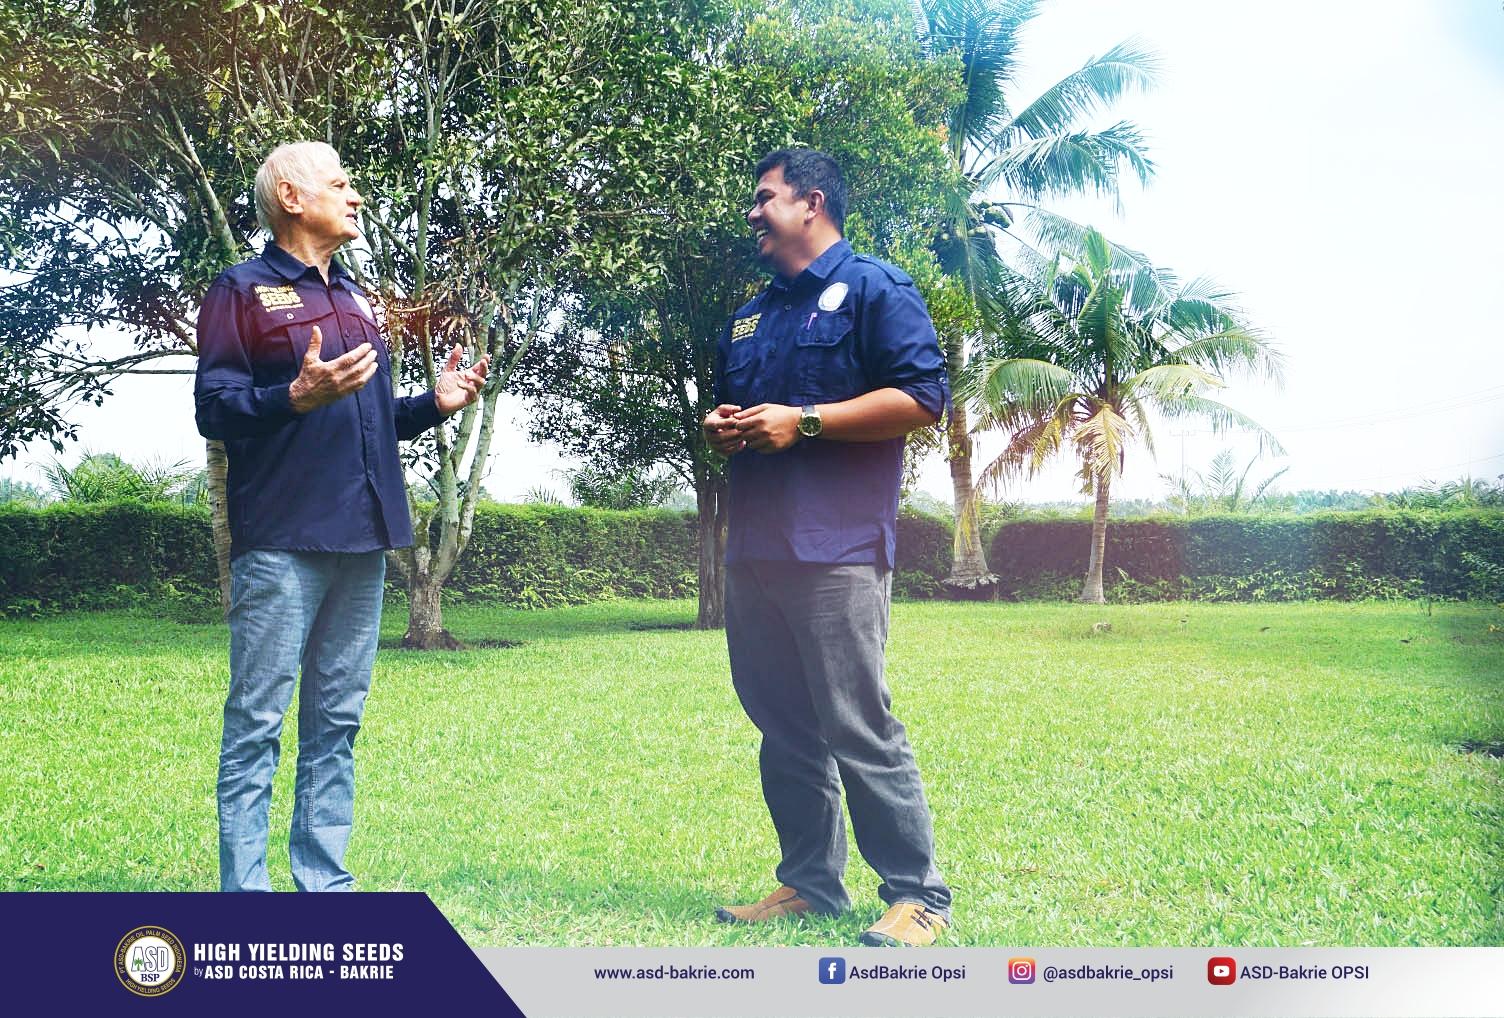 Dr Cornelis Jan Breure - plant breeder di PT ASD Bakrie Oil Palm Seed Indonesia